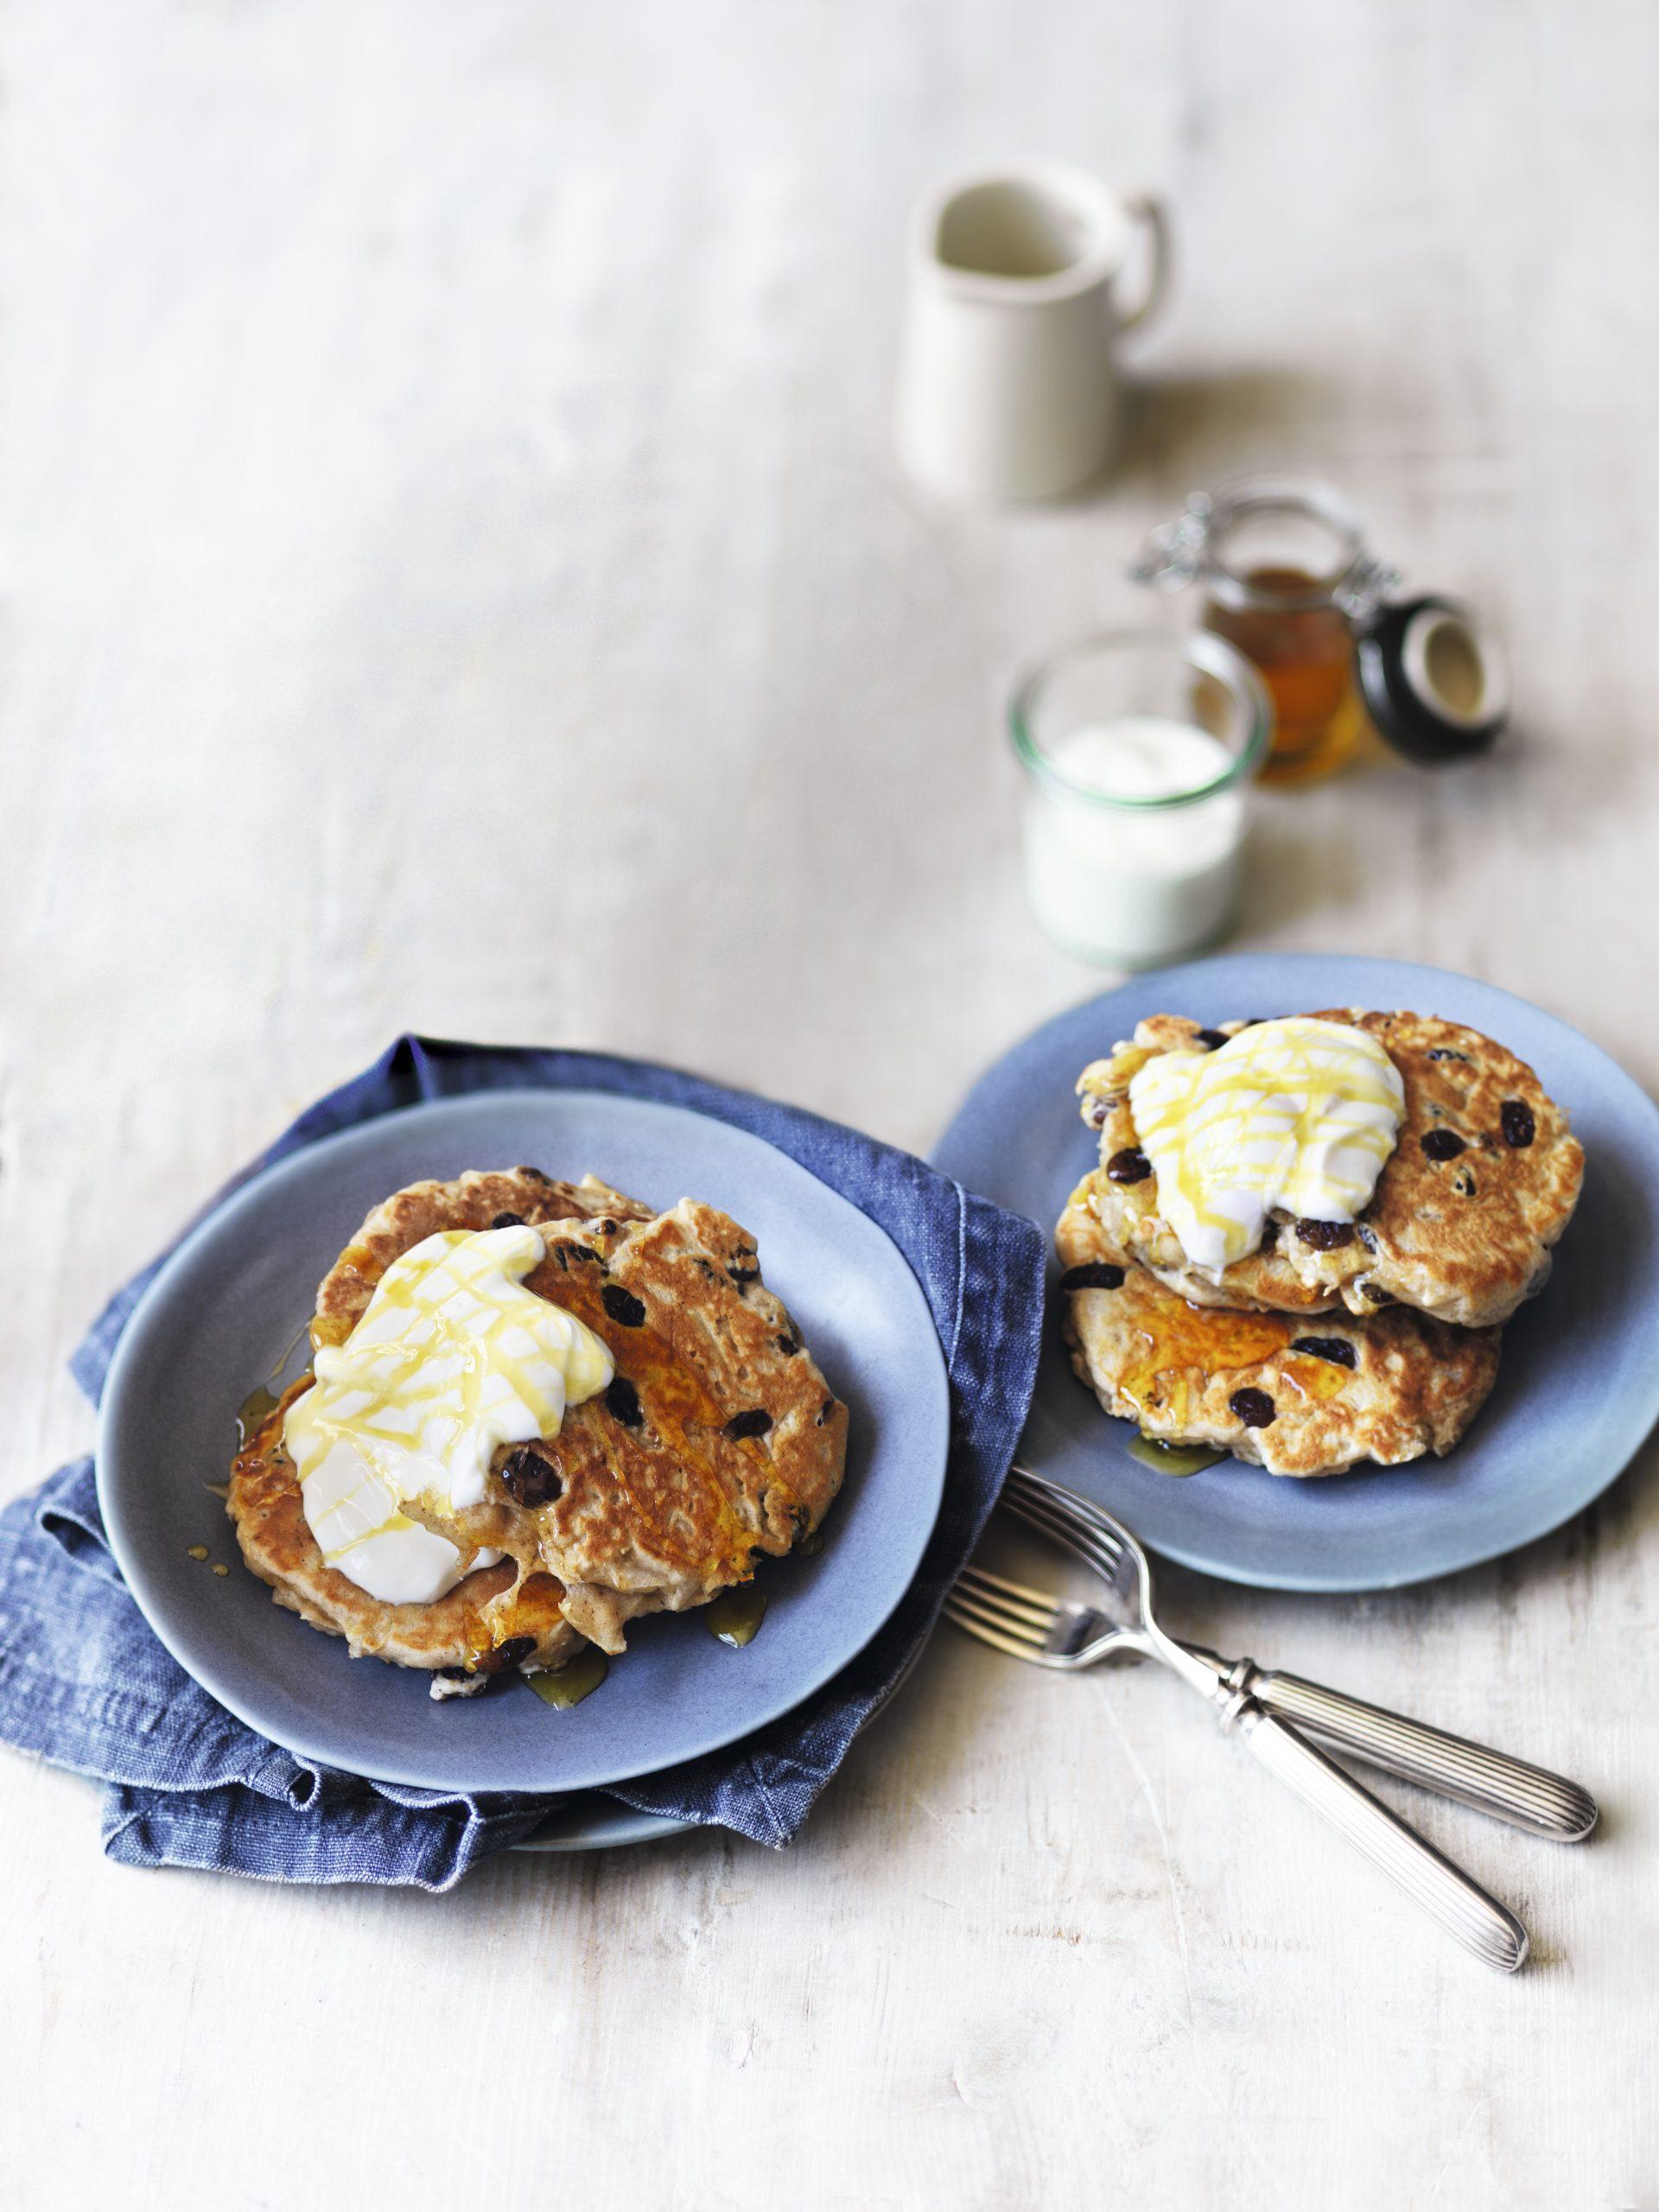 Recipe: Apple & cinnamon pancakes